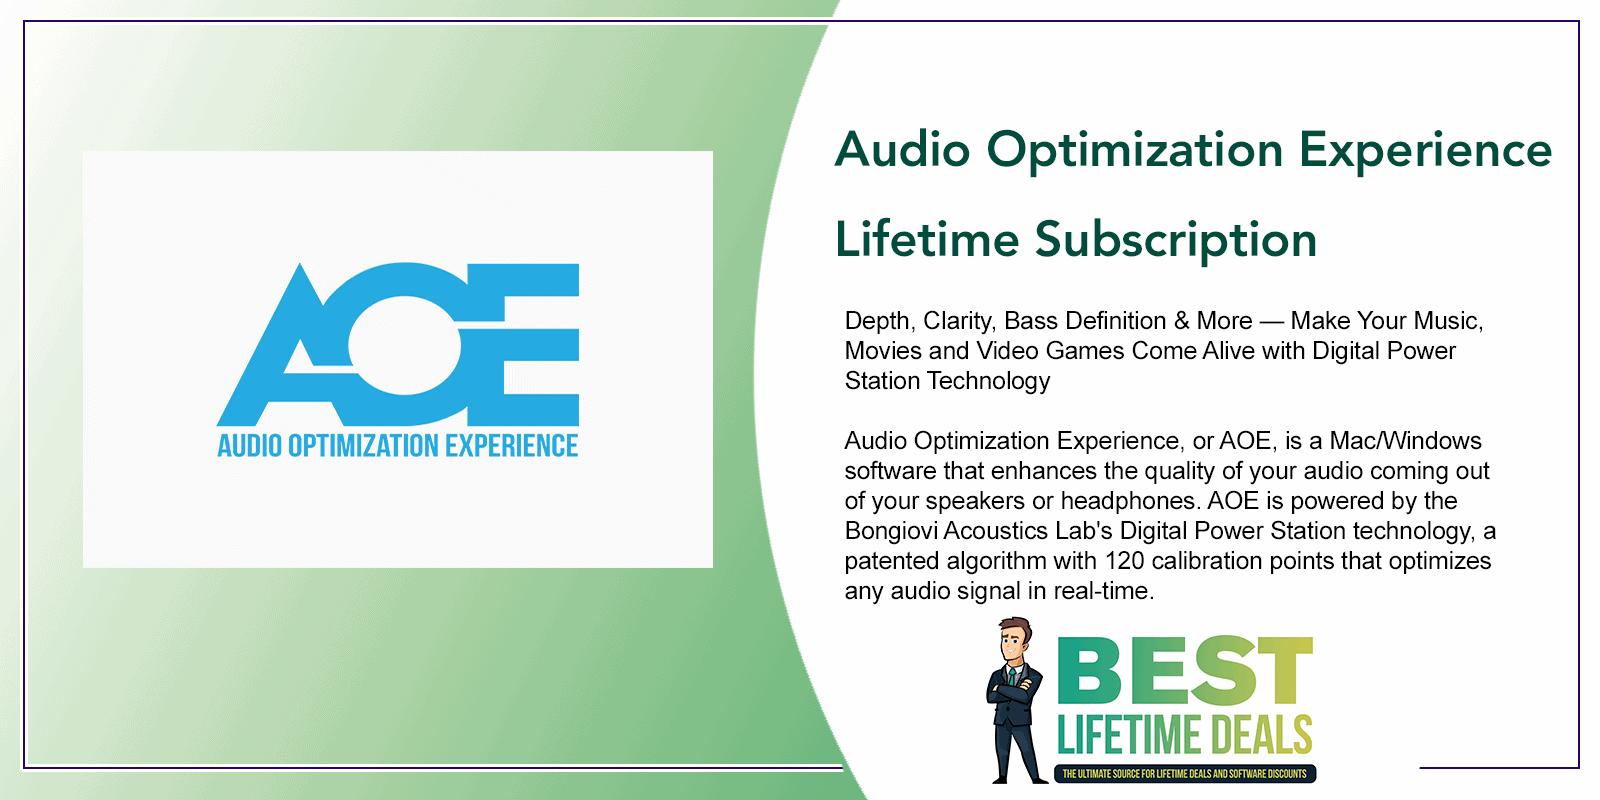 Audio Optimization Experience Featured Image